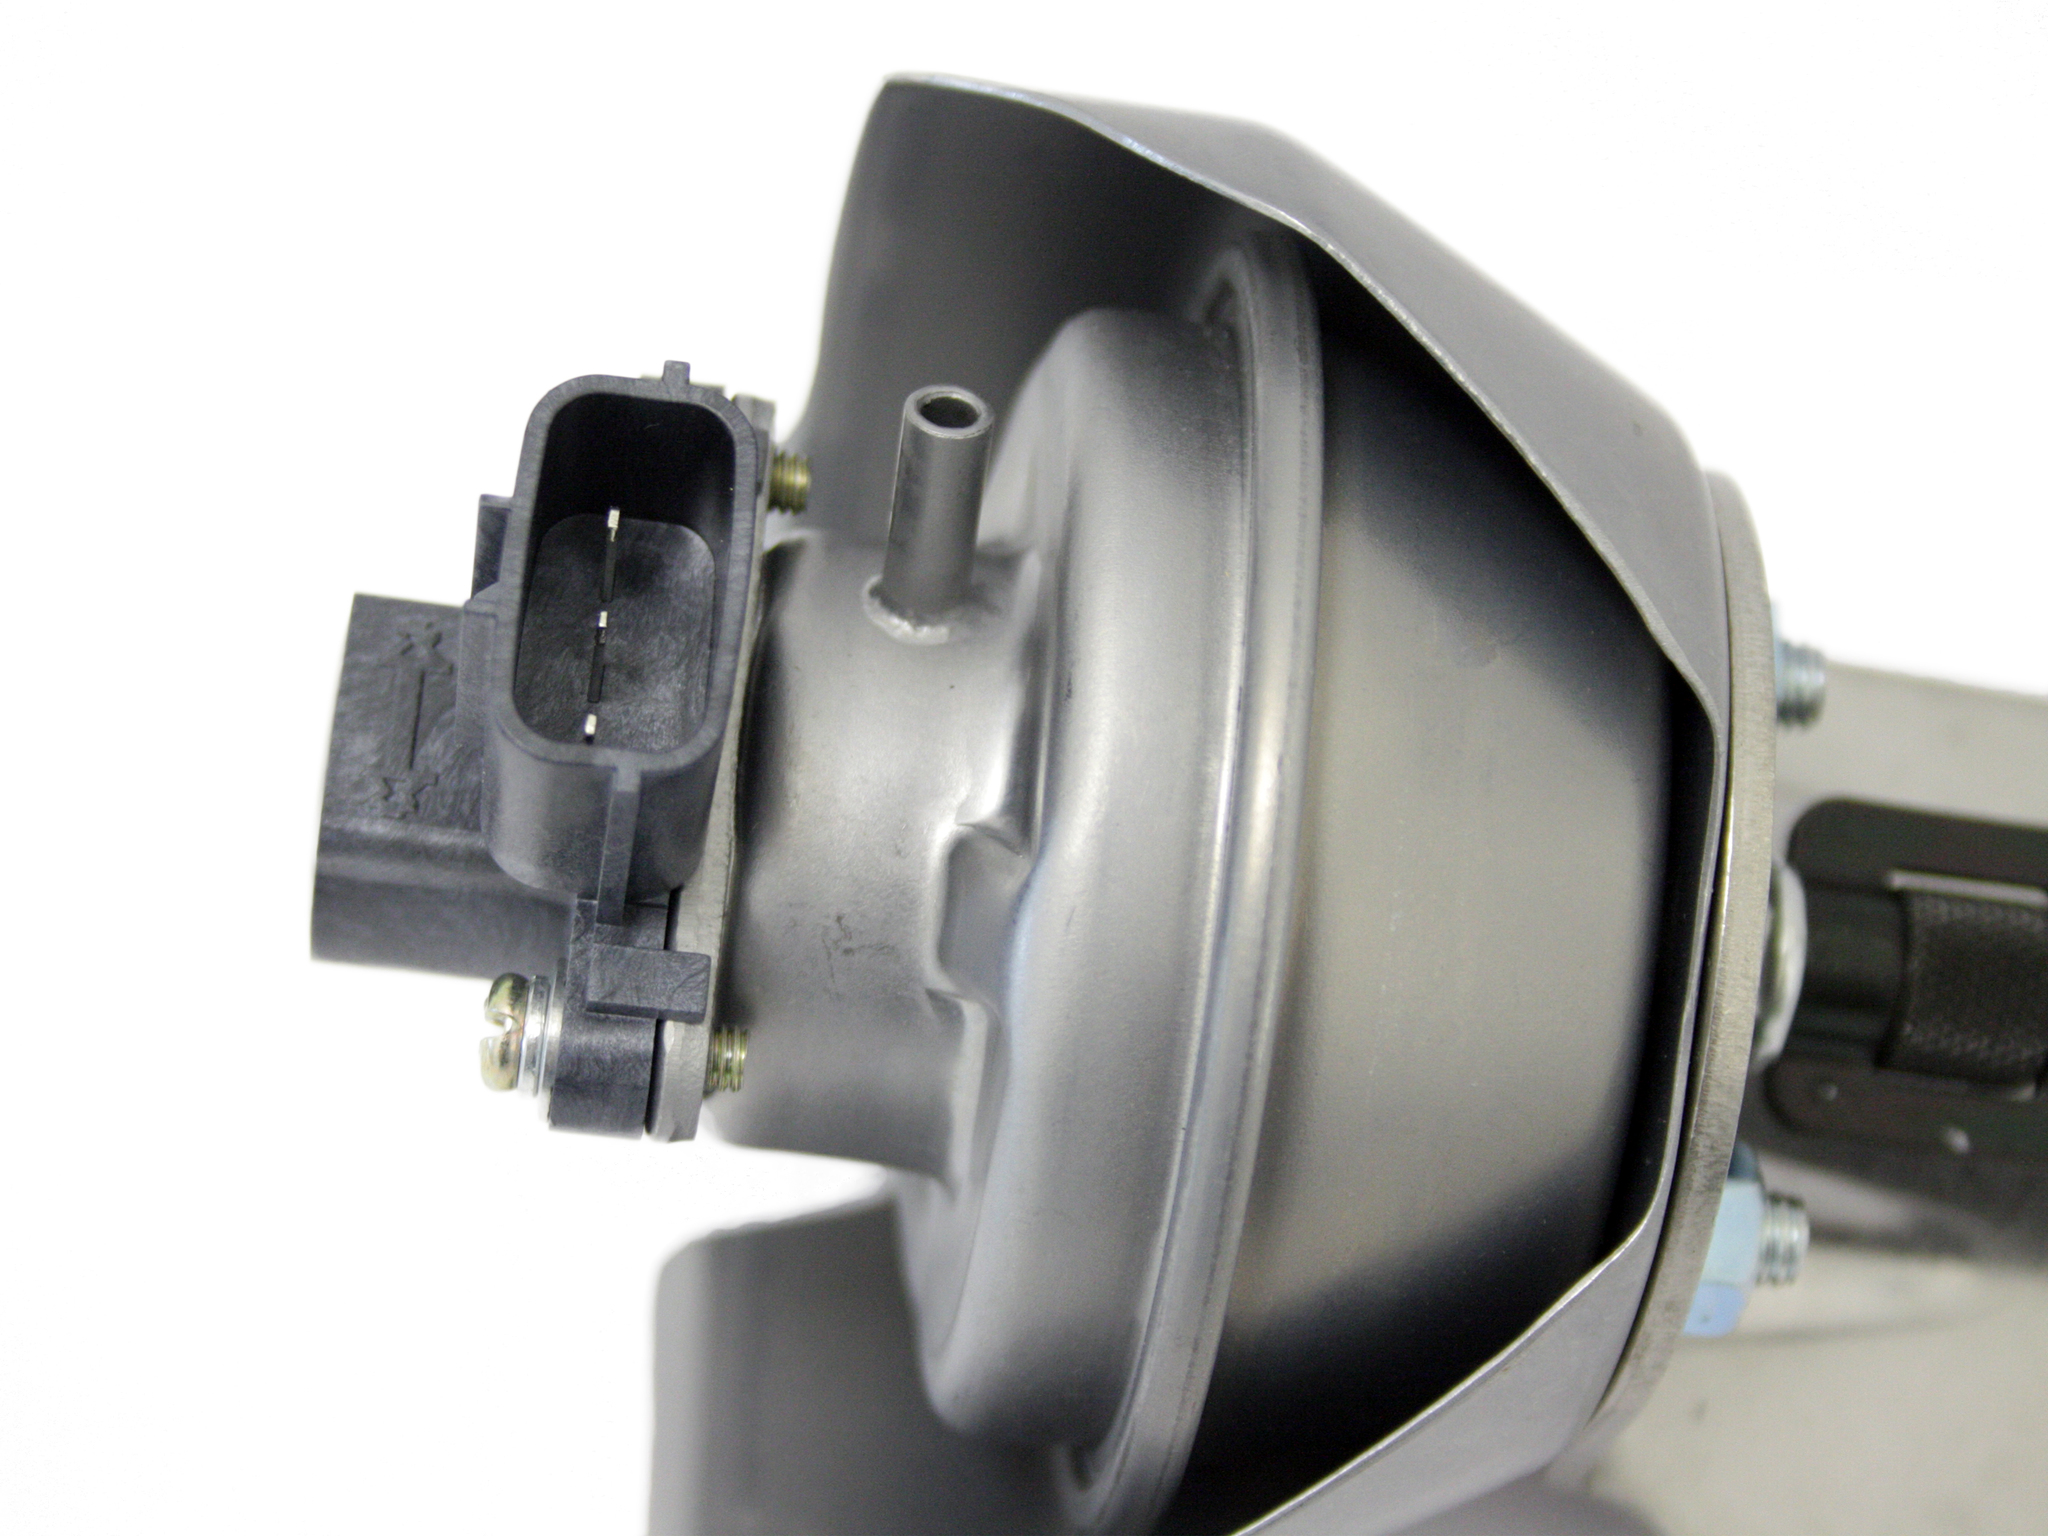 Актуатор (клапан) турбины GTA1749V Форд / Вольво 2.0 136 / 140 л.с.